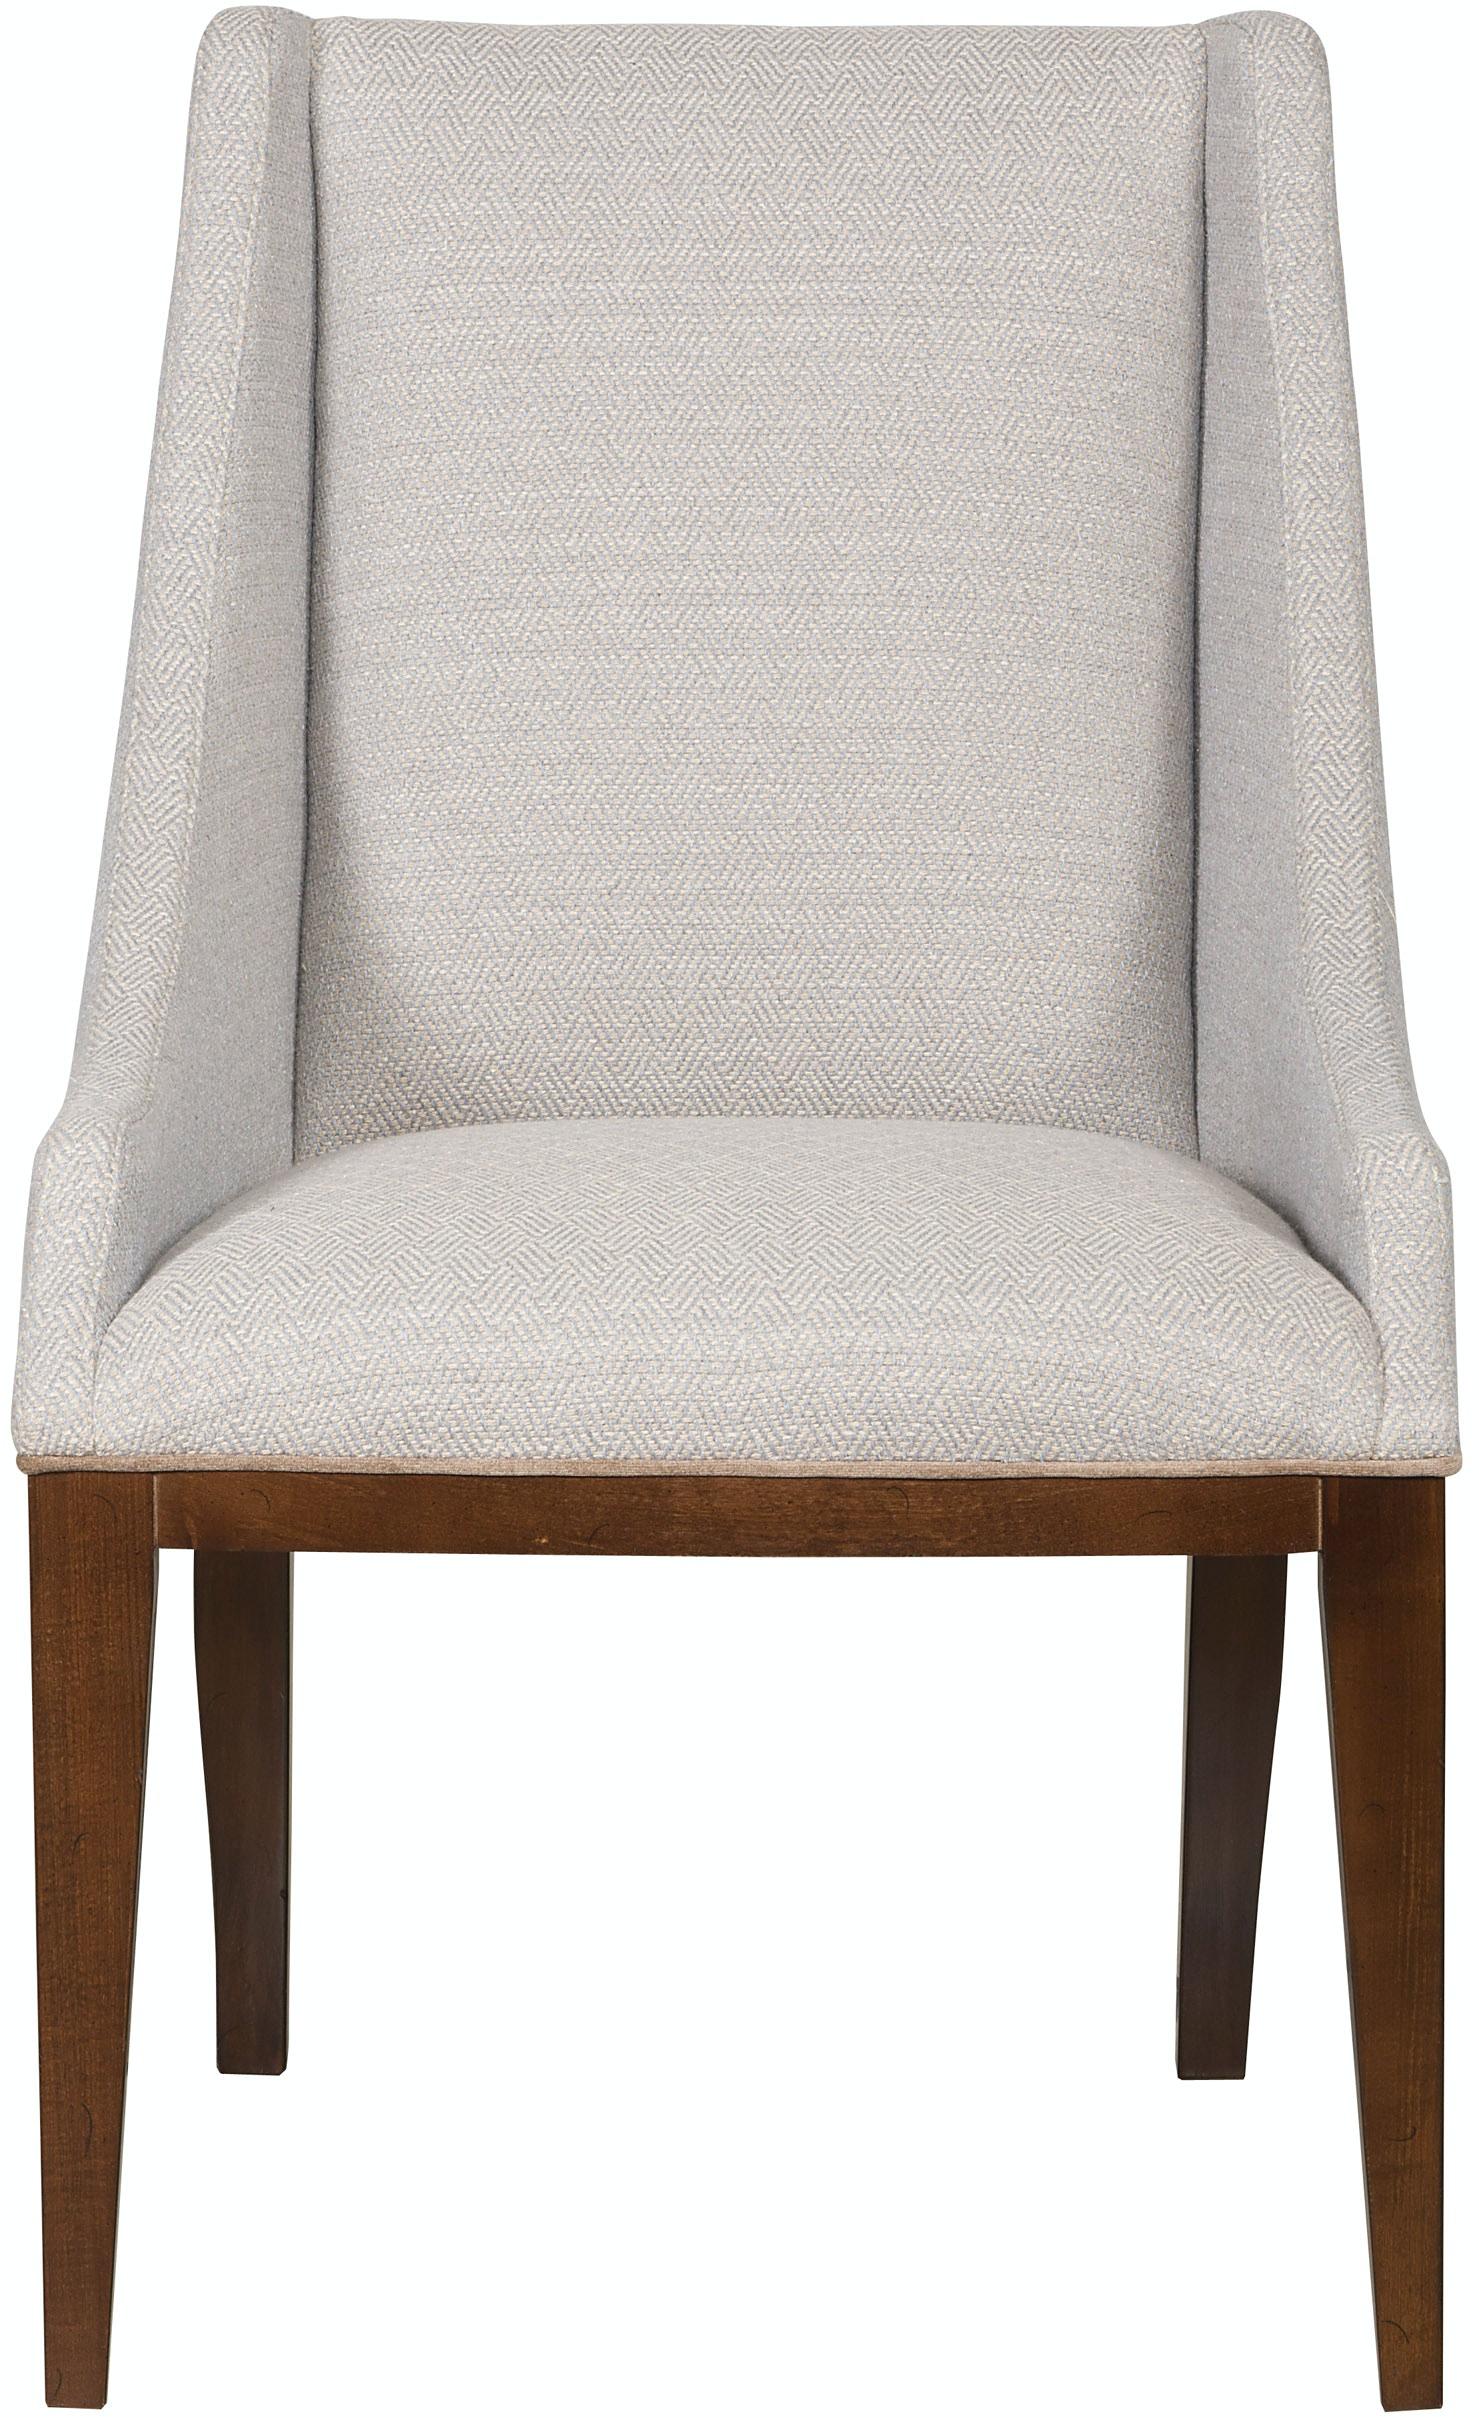 Vanguard Ithaca Dining Arm Chair 9706A